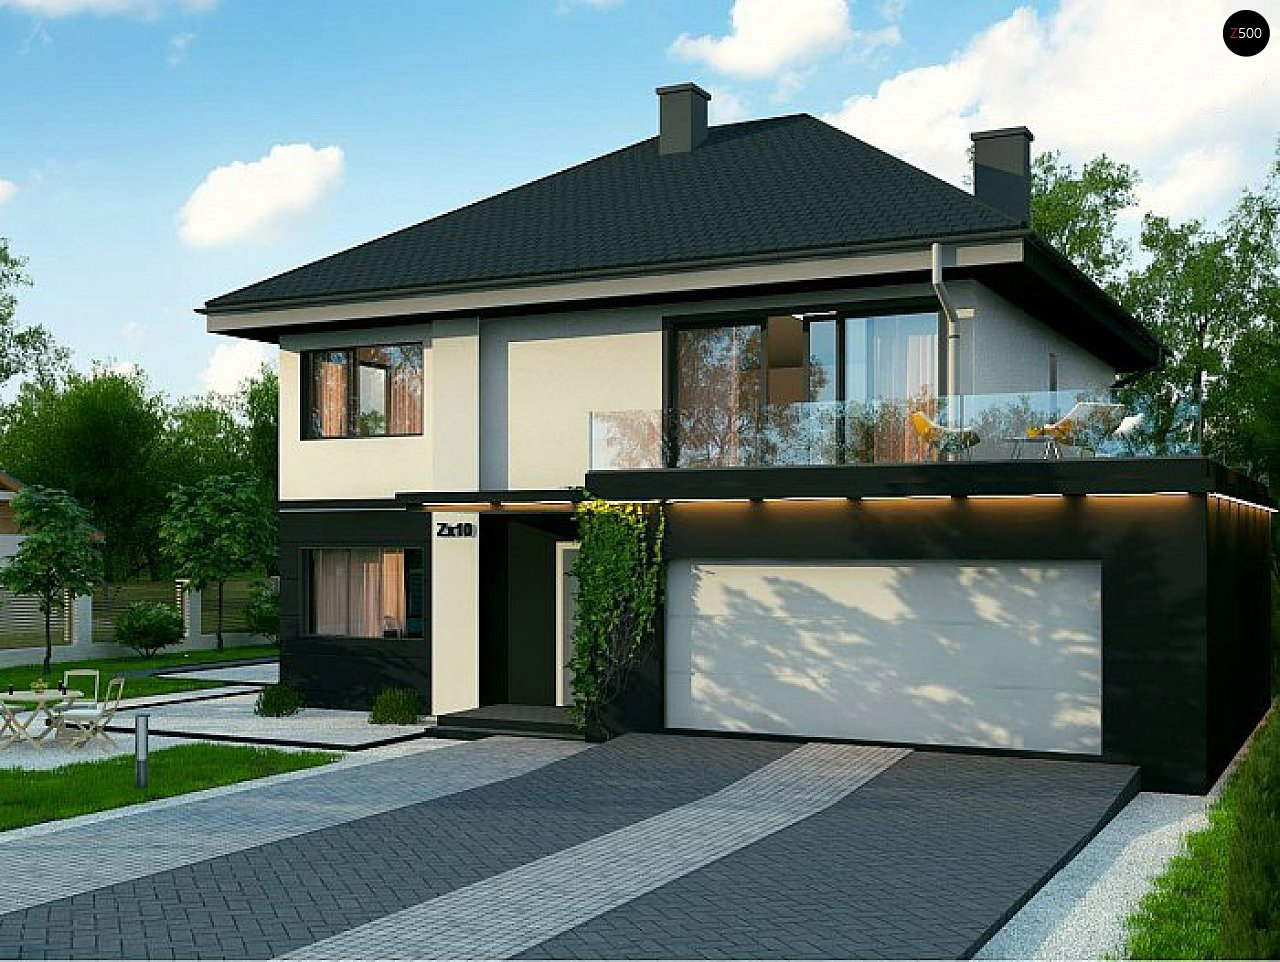 Проект будинку Zx10 F - 1